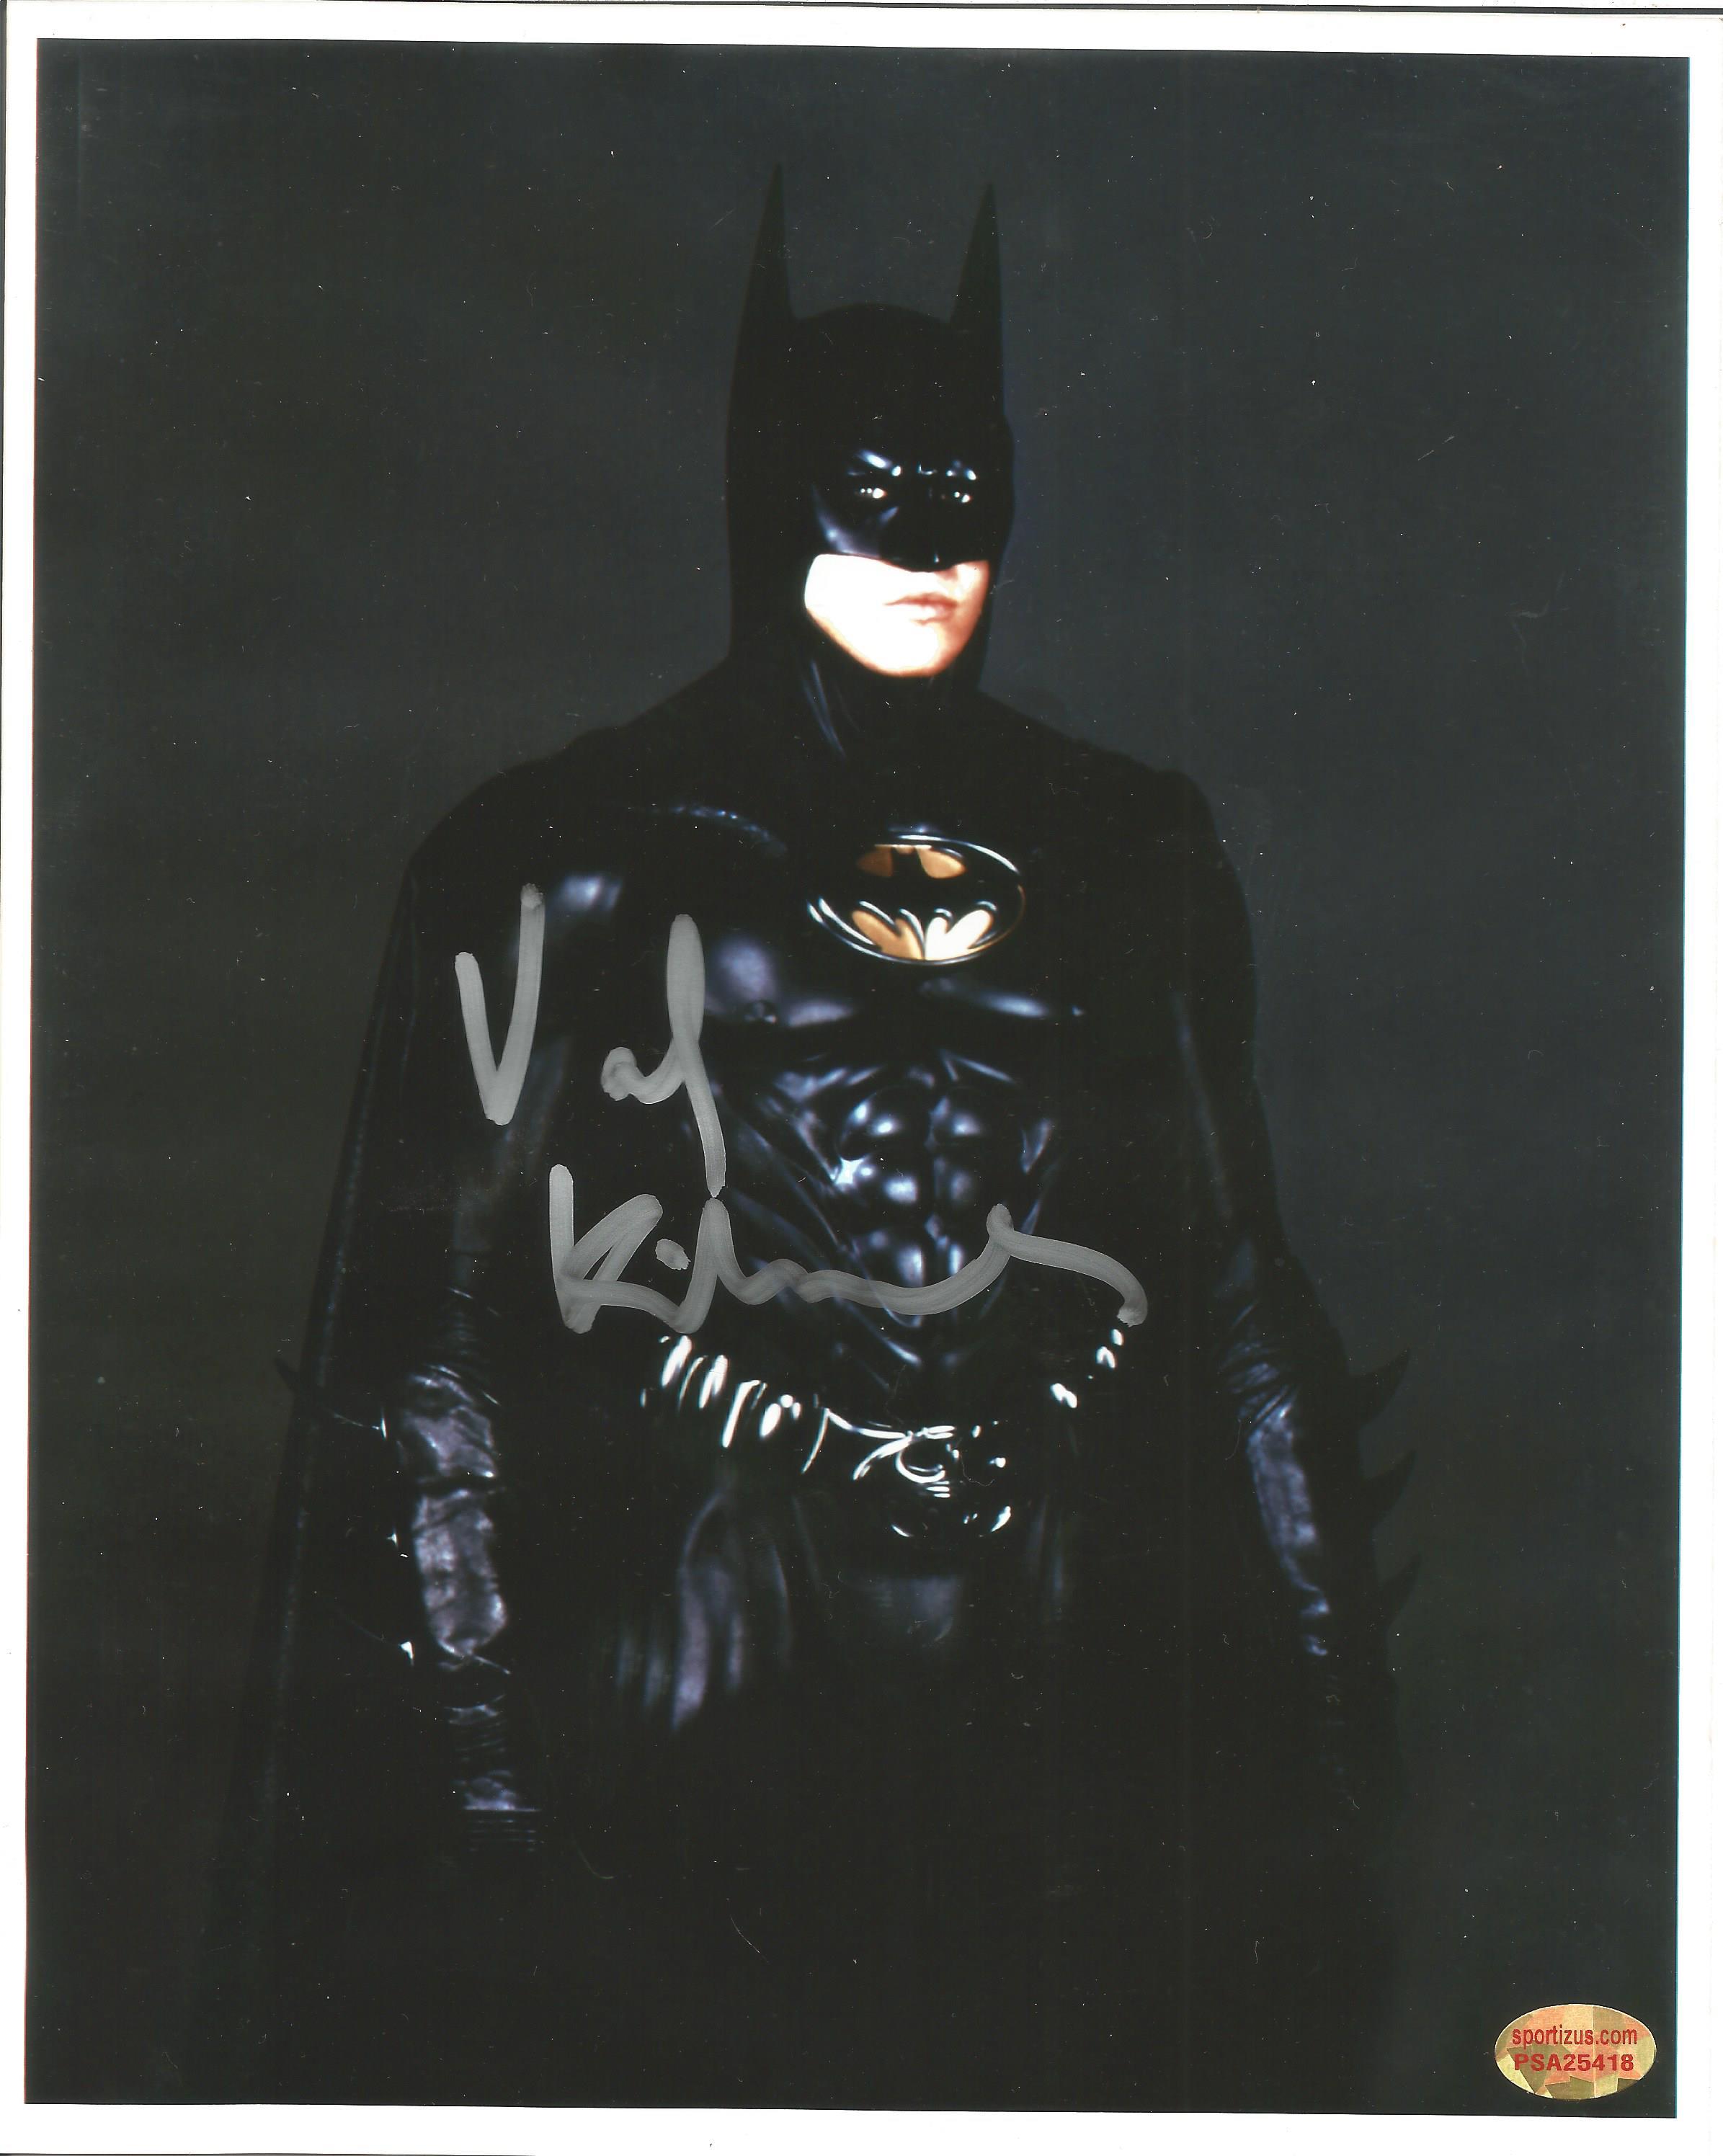 Actor Val Kilmer signed 10x8 colour image in character as Batman. Val Edward Kilmer born December